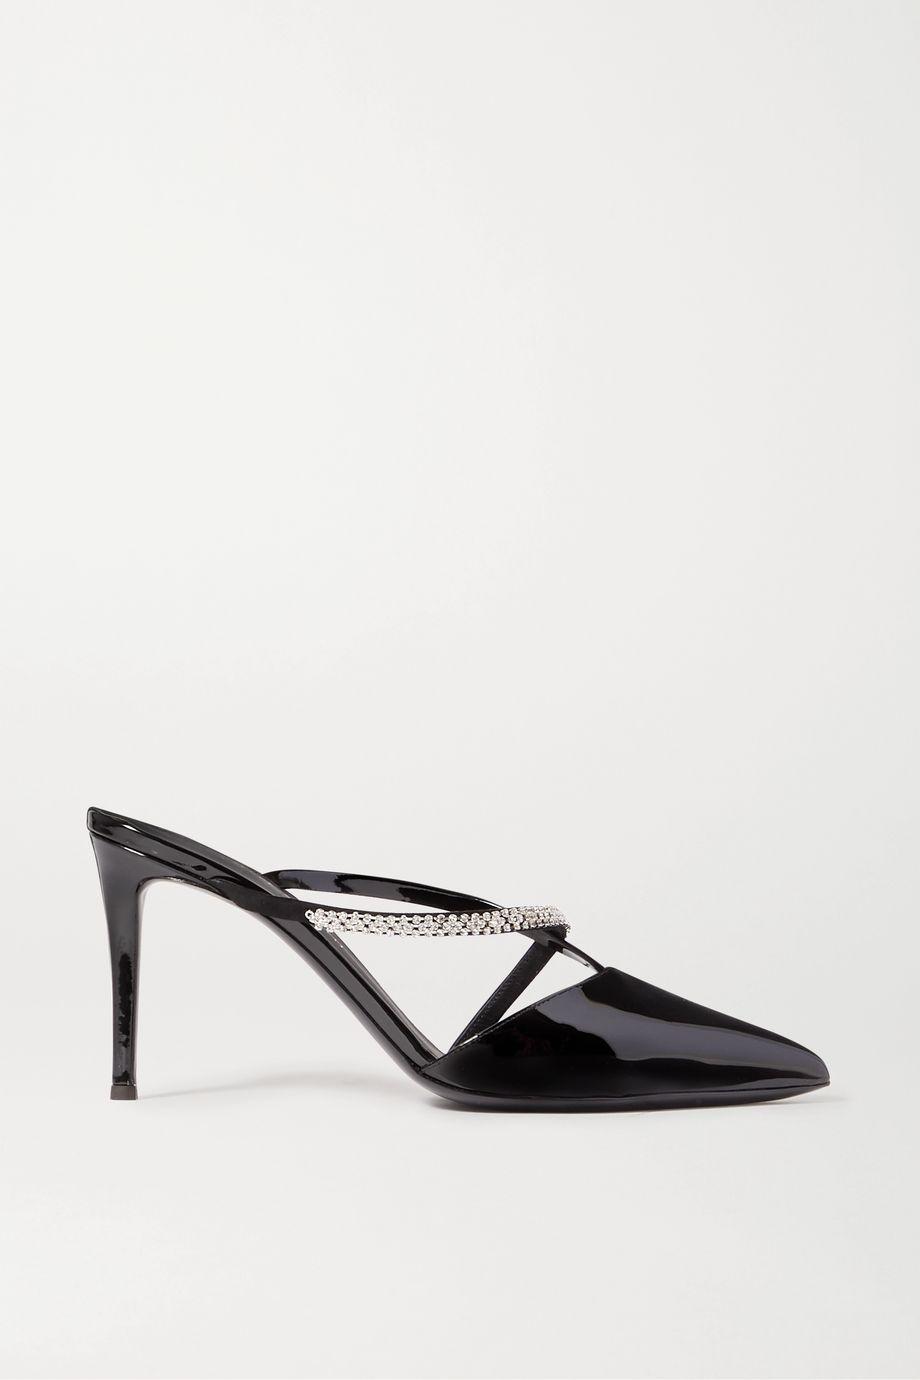 Giuseppe Zanotti Crystal-embellished patent-leather mules